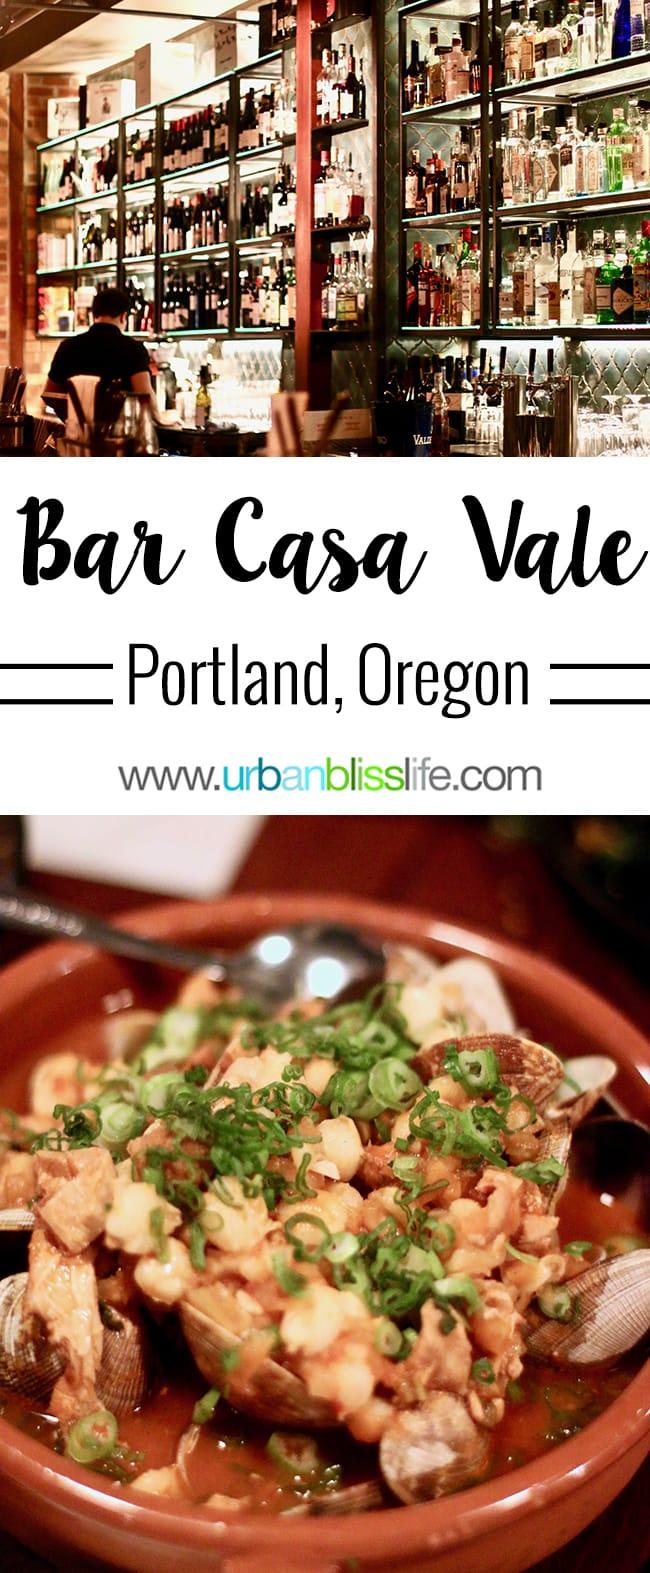 Bar Casa Vale Portland, Oregon Spanish Tapas Bar and Restaurant